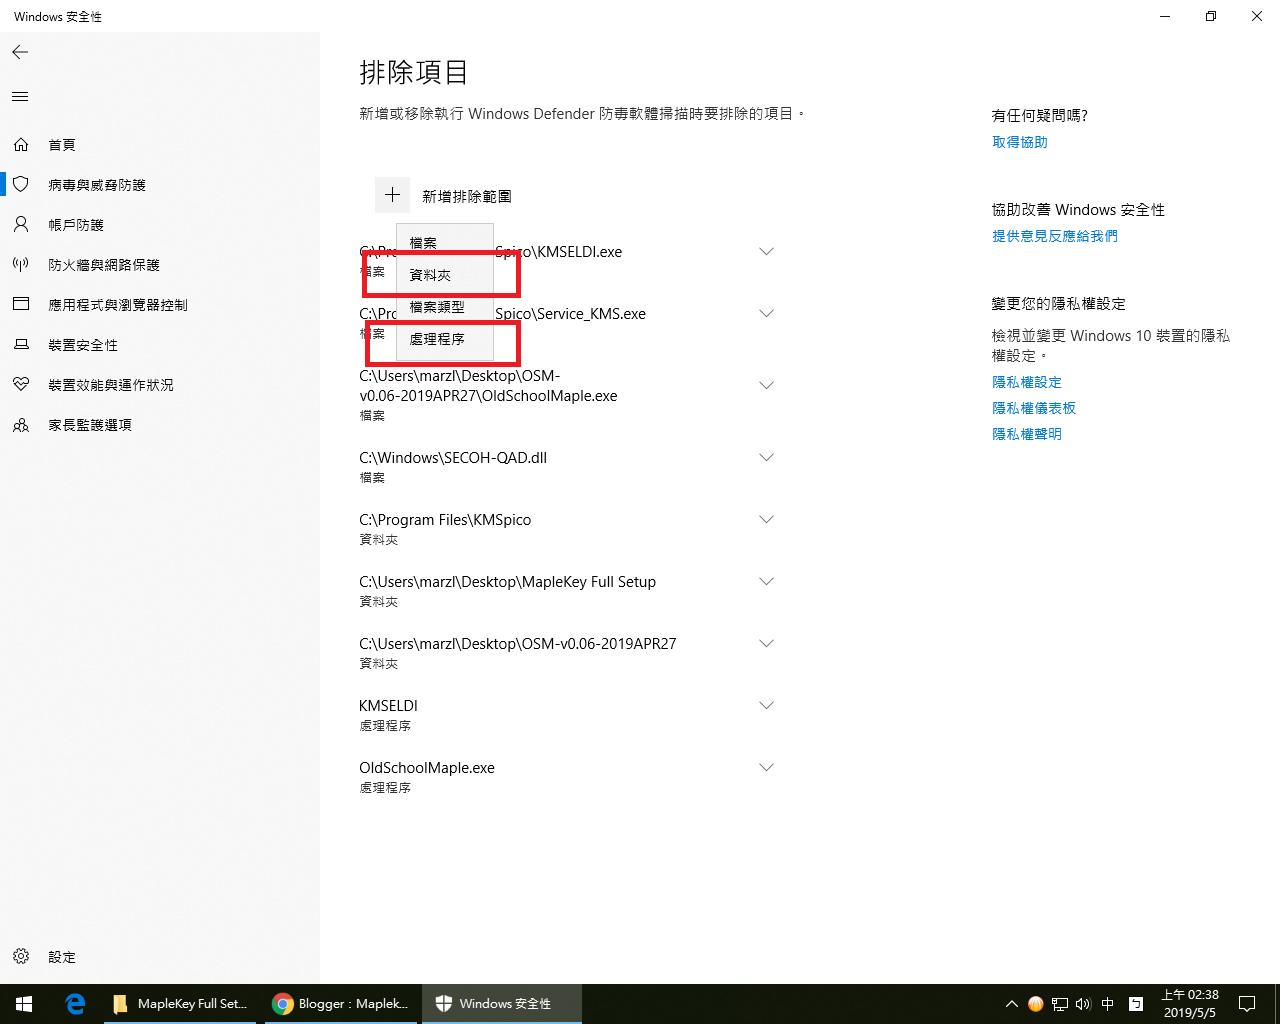 Maplekey 國外私服中文攻略站: 下載&安裝&註冊教程